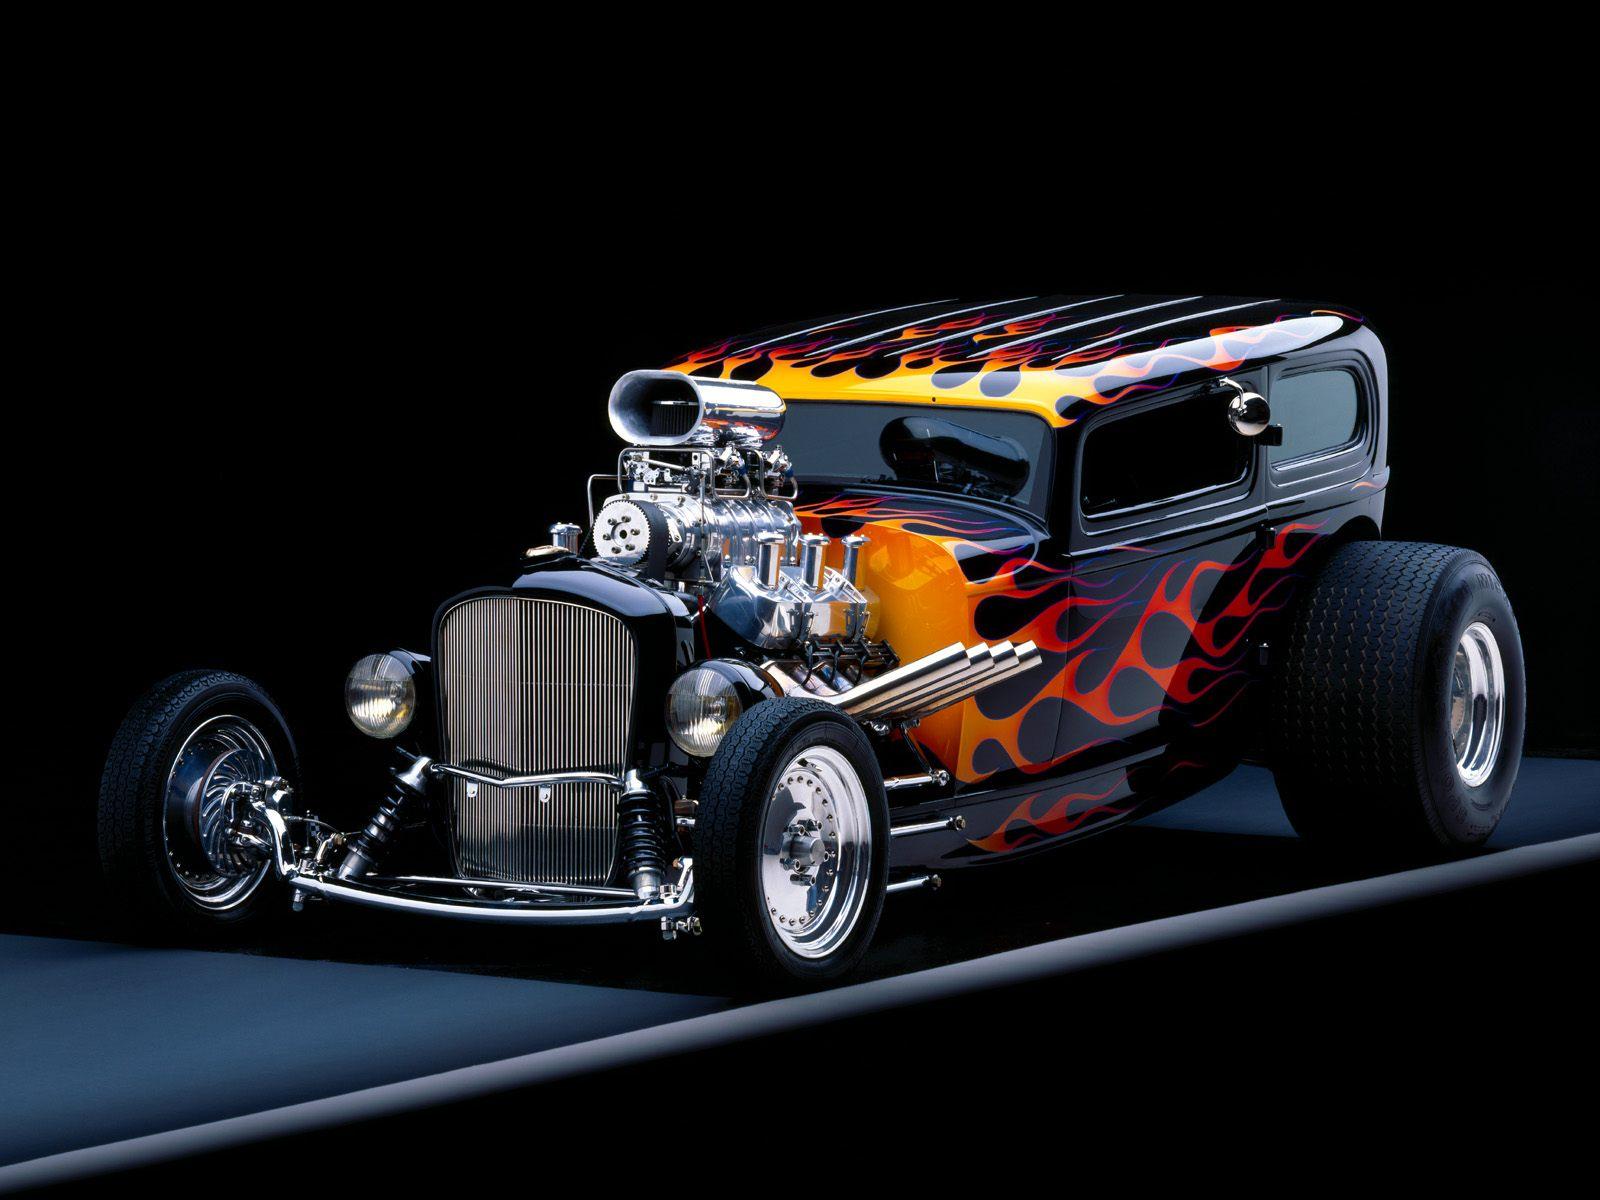 Vehicles - Car  Custom Car Hotrod Flame Paint Hot Rod Wallpaper